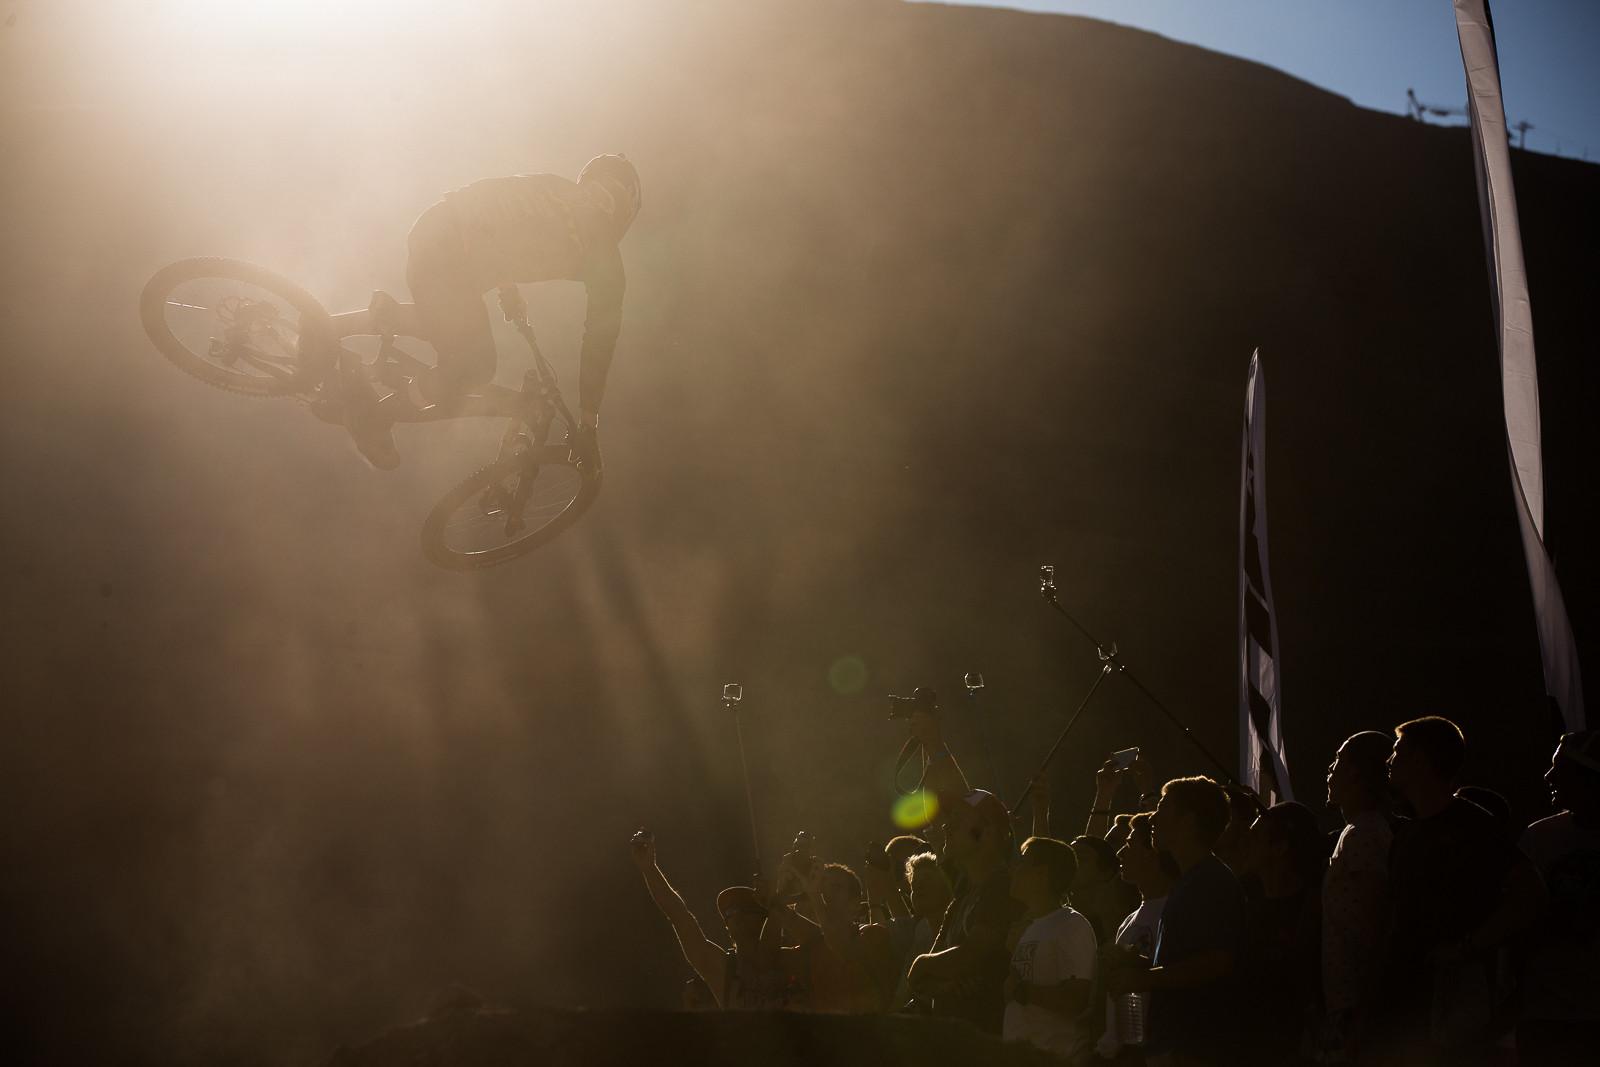 Bernard Kerr, Whip Off European Champs, Crankworx L2A - Whip Off European Champs, Crankworx L2A - Mountain Biking Pictures - Vital MTB